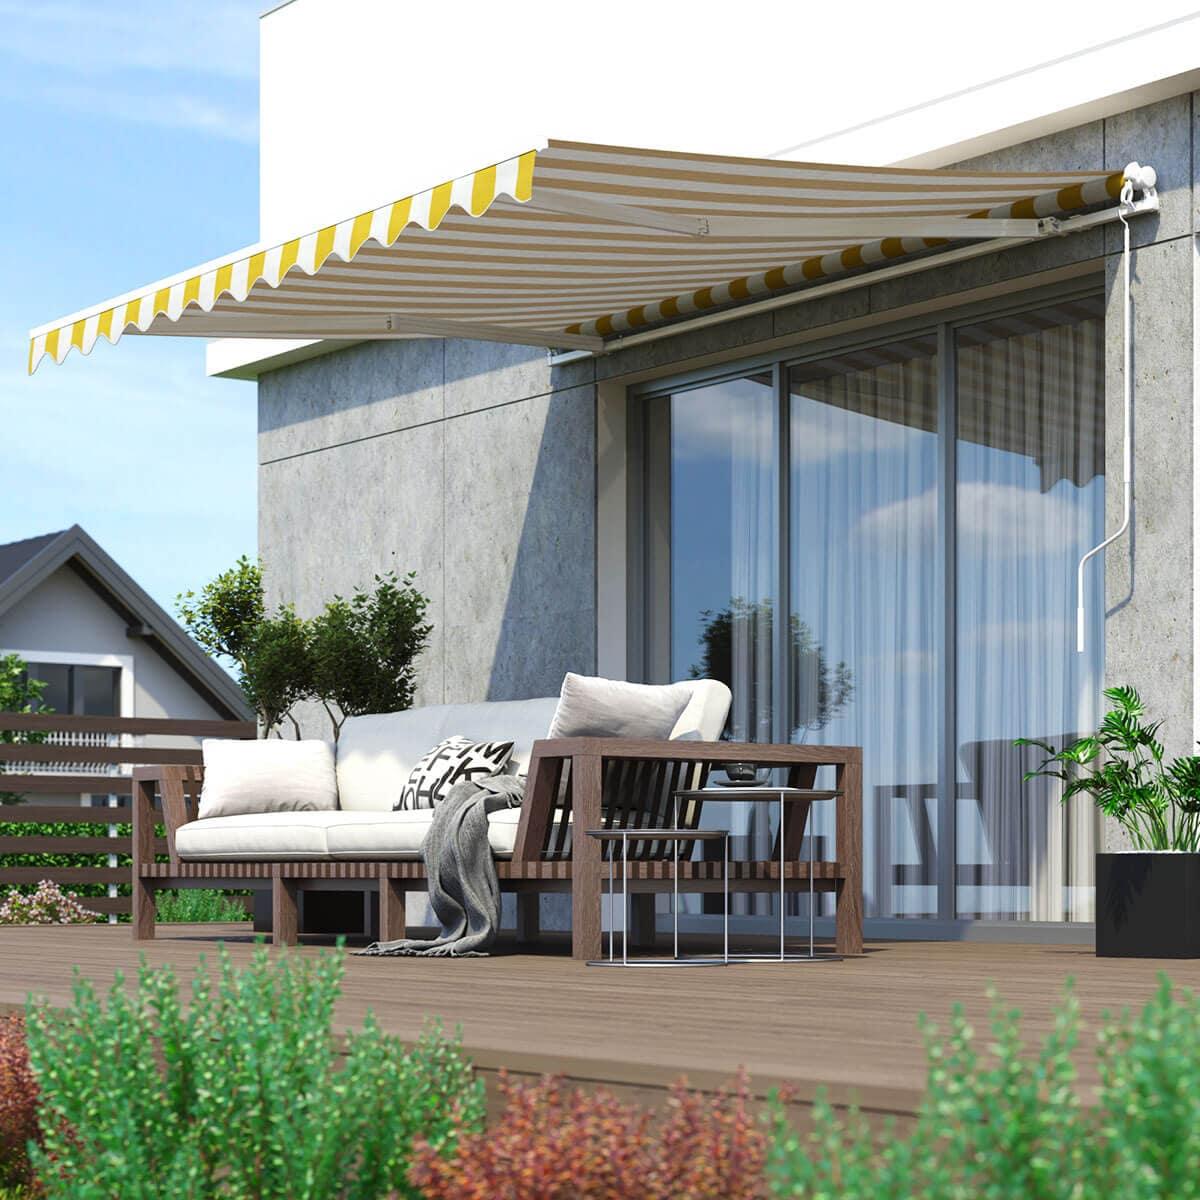 gelenkarm markise 6m broxsun acapulco breite bis m auslage bis m with gelenkarm markise 6m. Black Bedroom Furniture Sets. Home Design Ideas